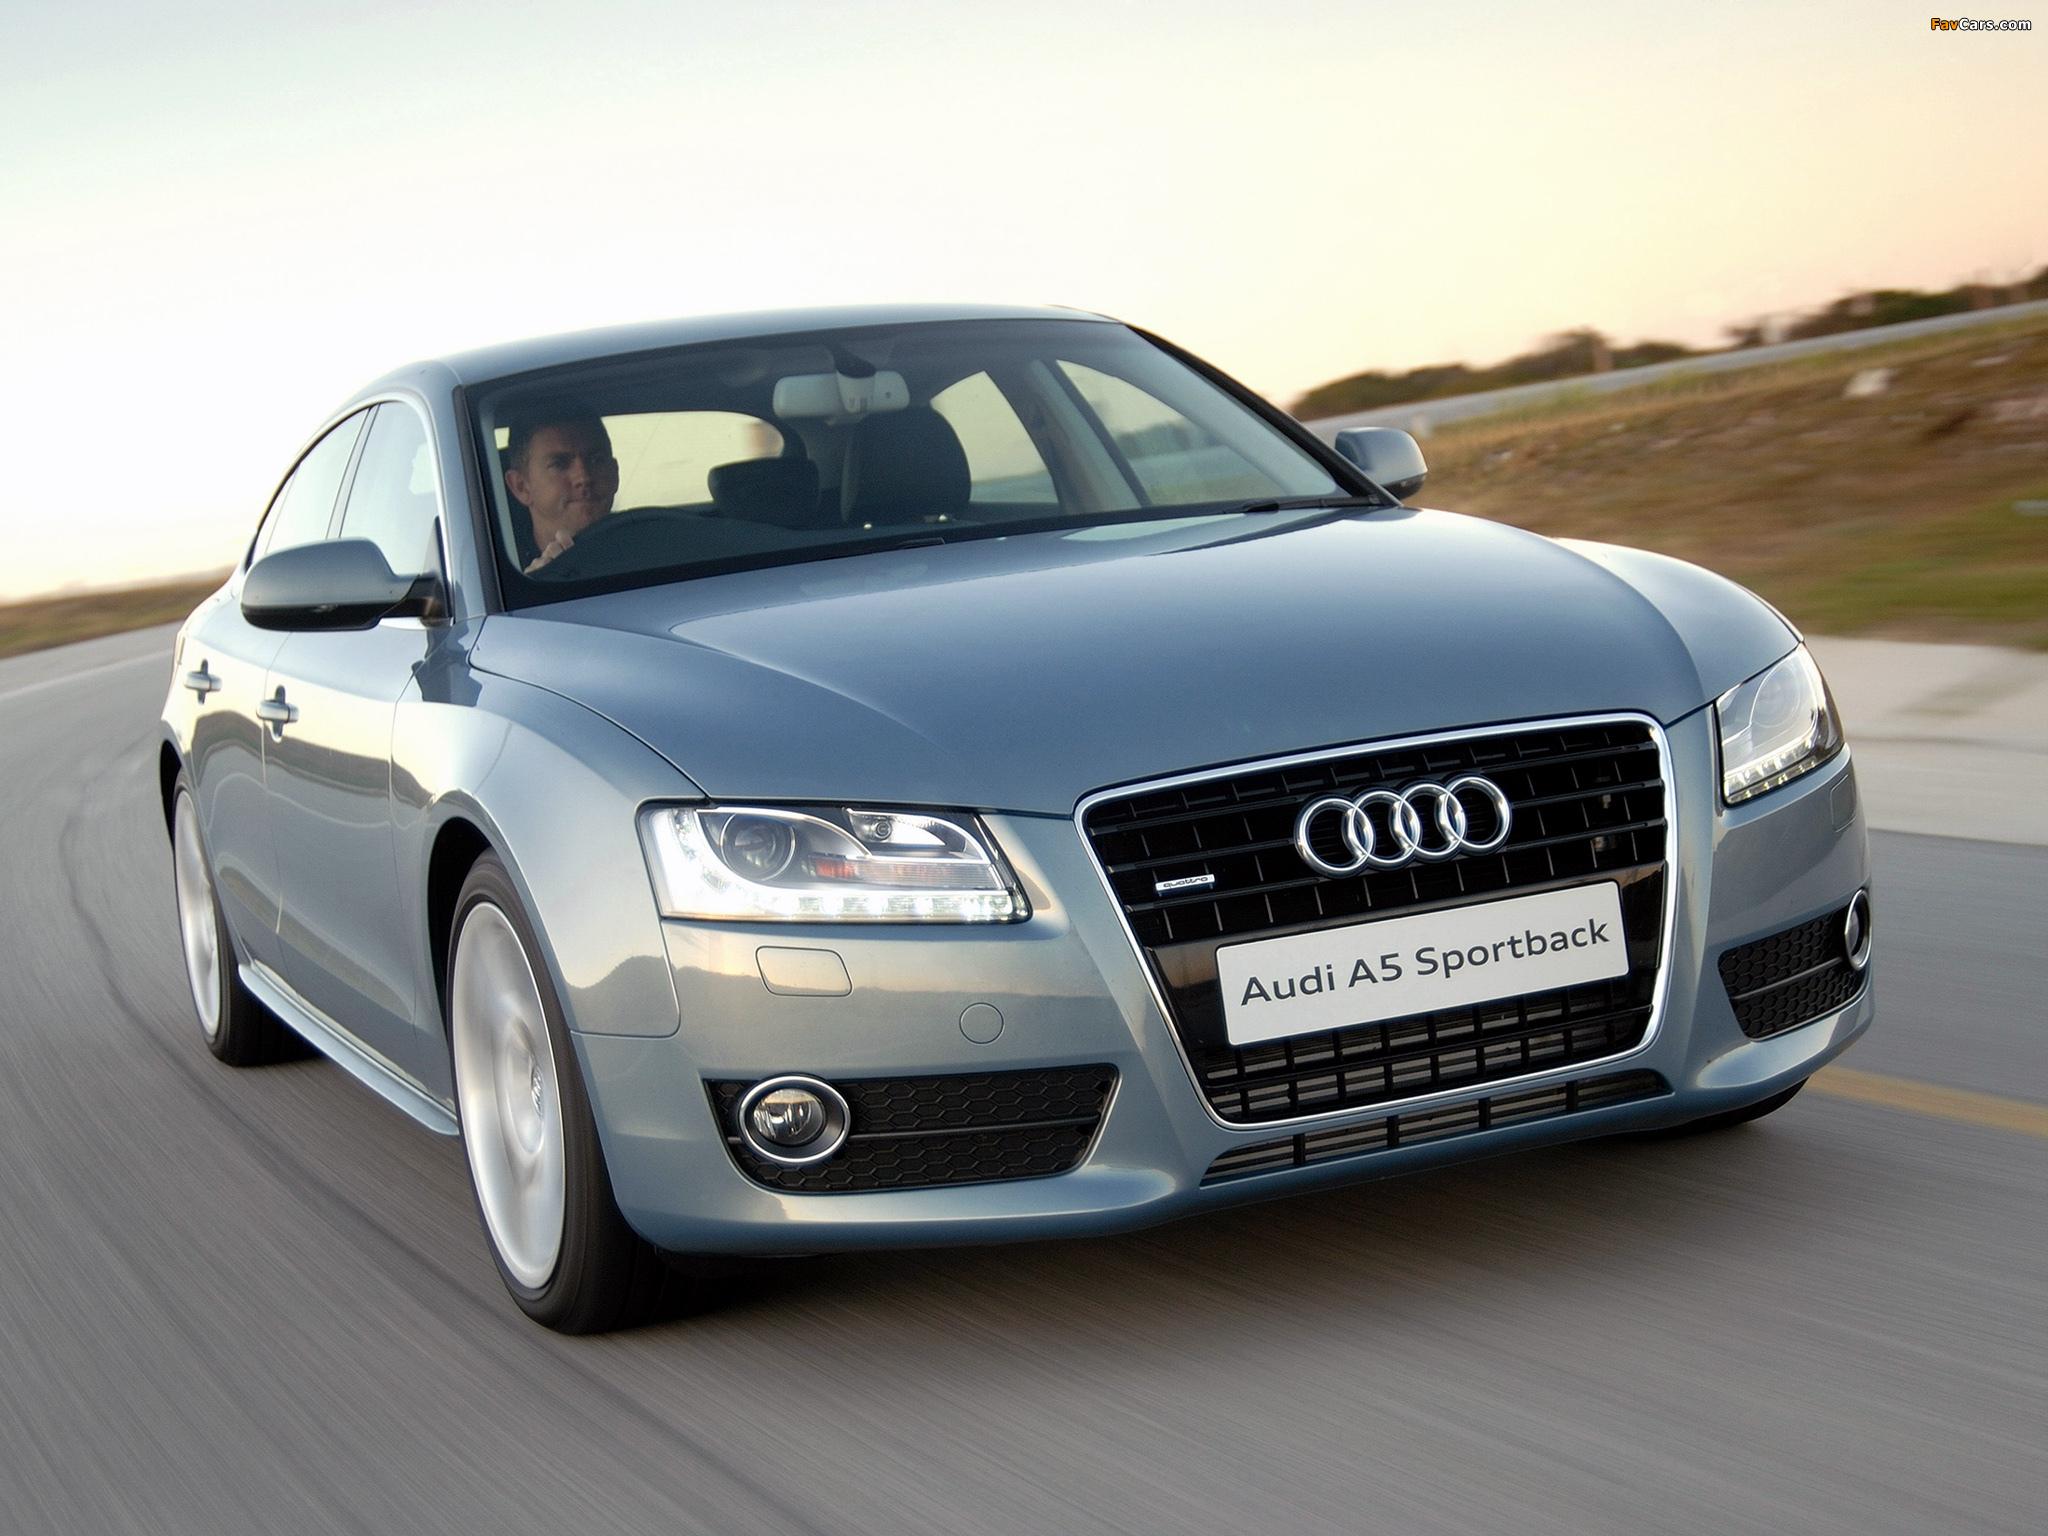 Audi A5 Sportback 3 0 Tdi Quattro Za Spec 2009 11 Images